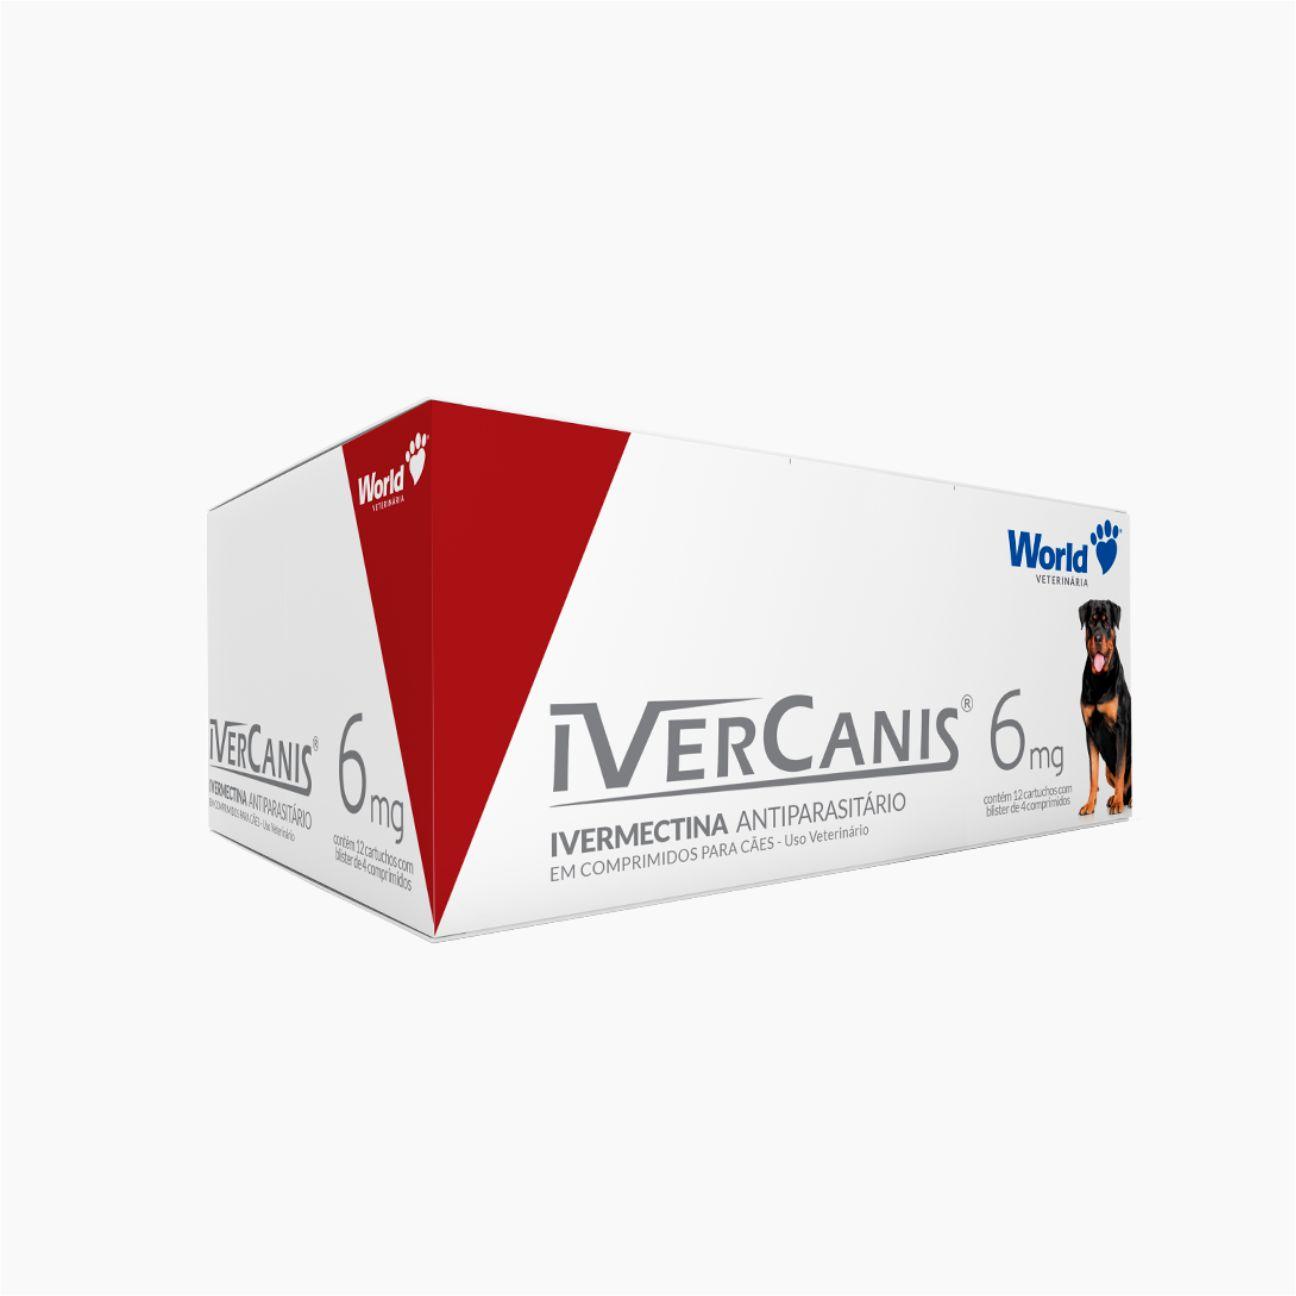 IverCanis 6mg